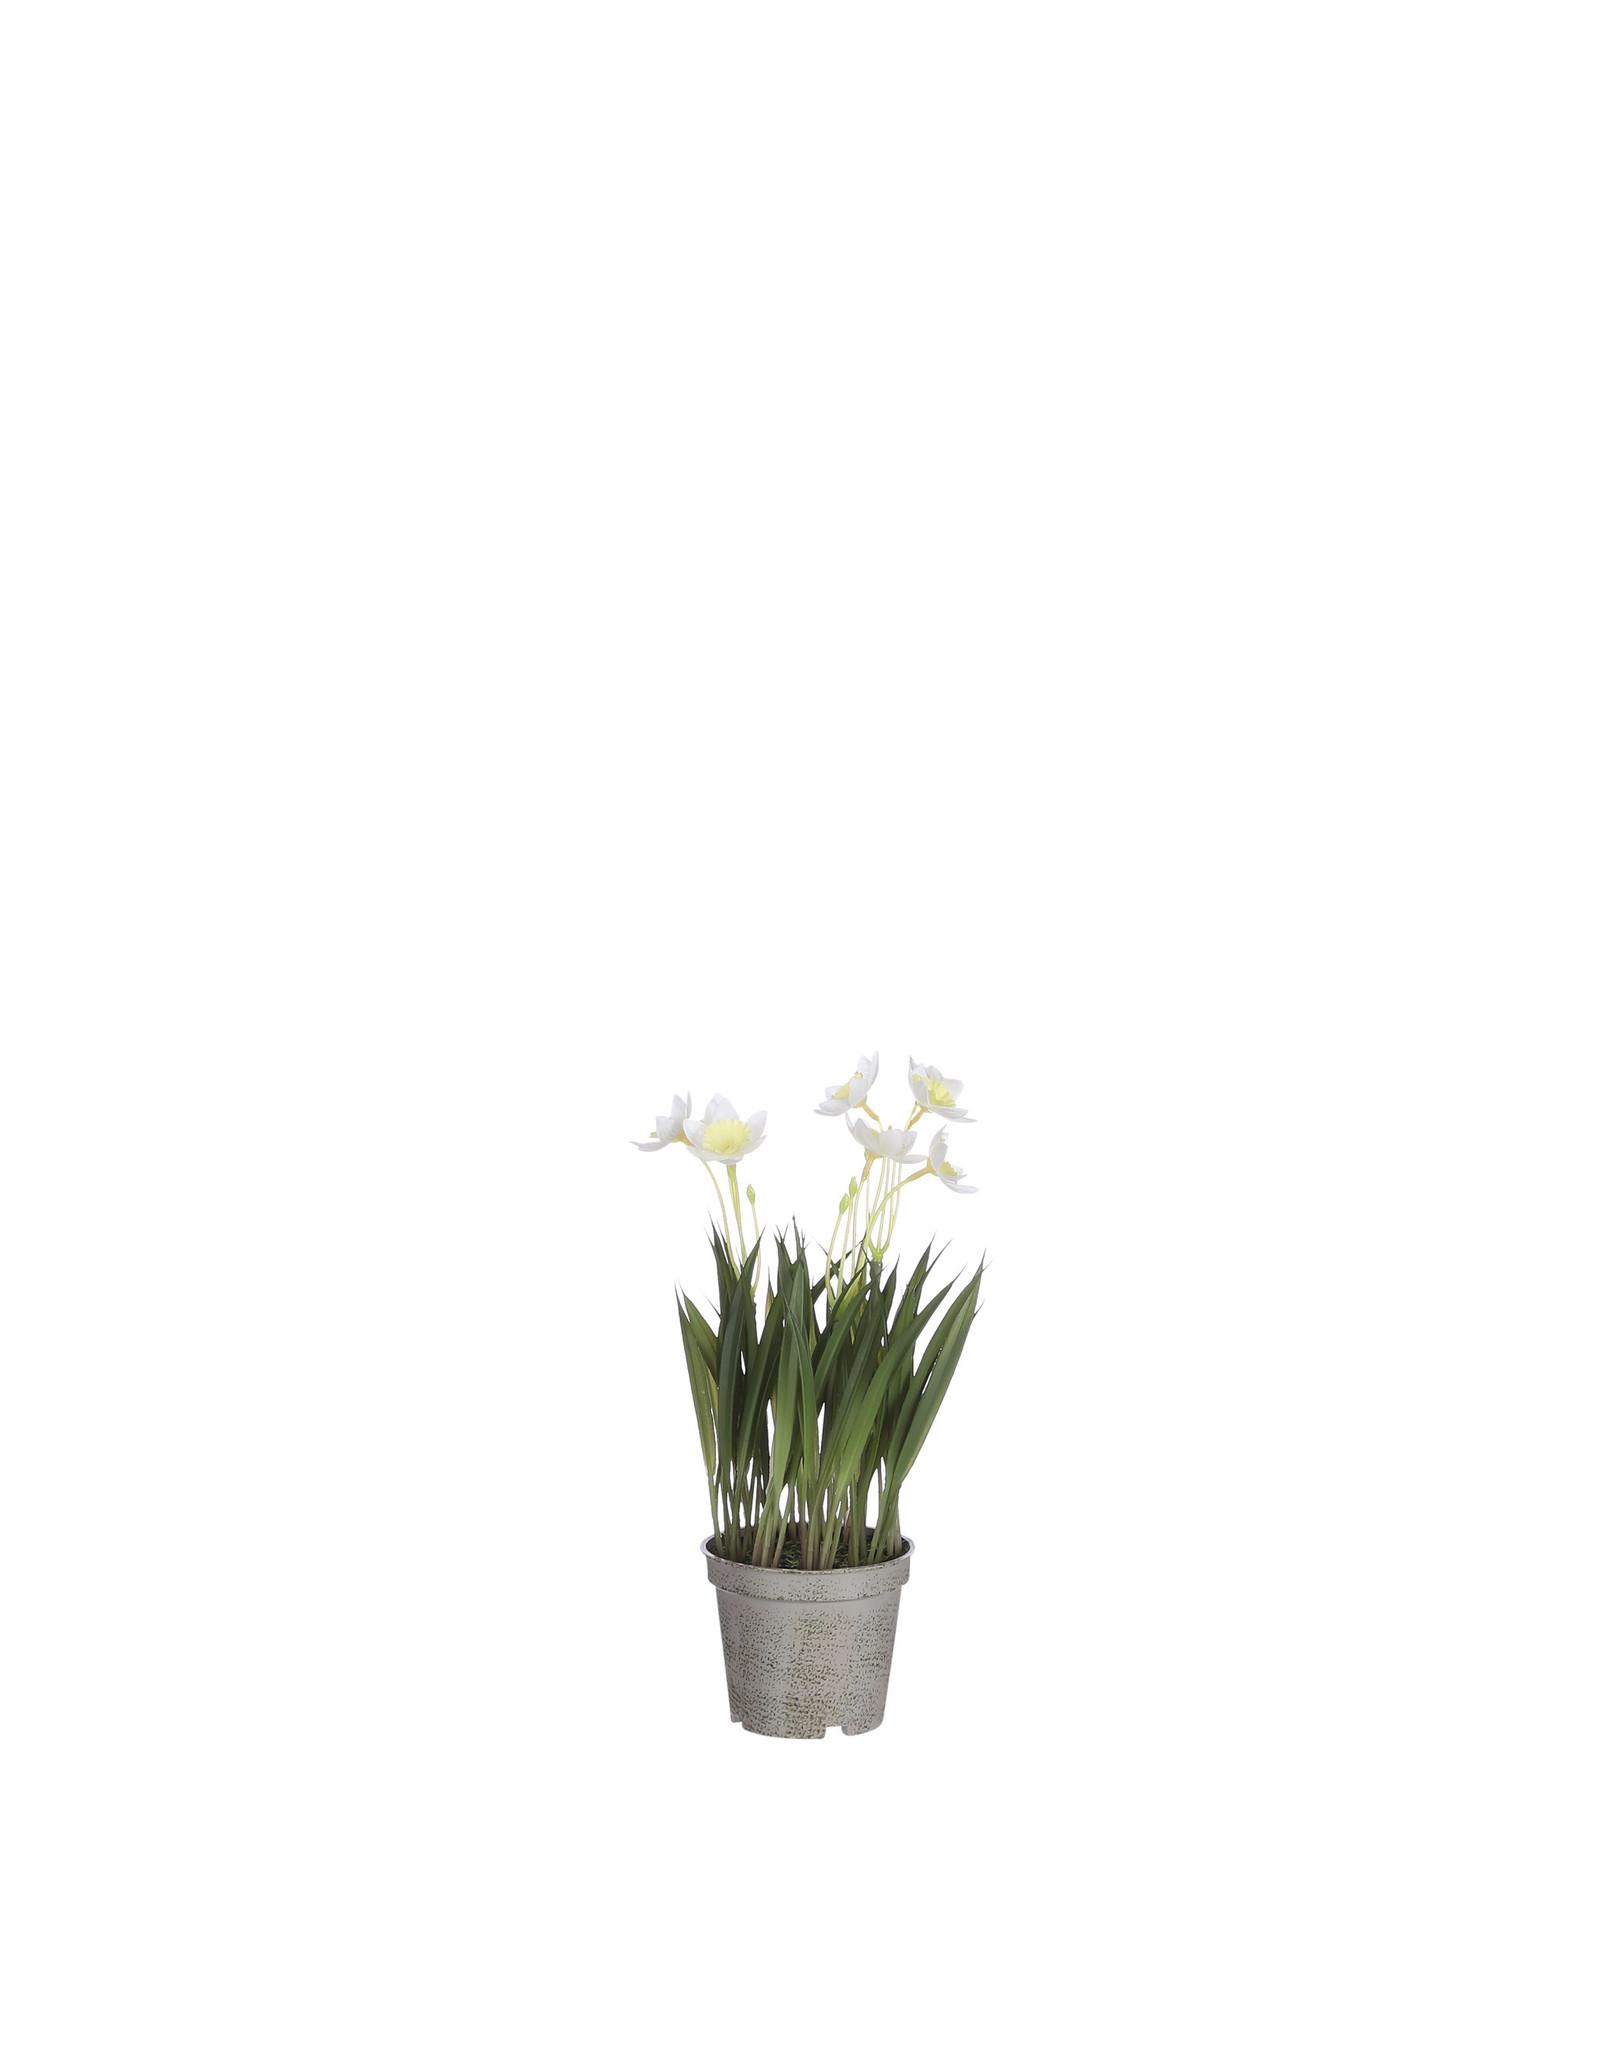 Mica Daffodil in Pot Cream - l26xd8.5cm